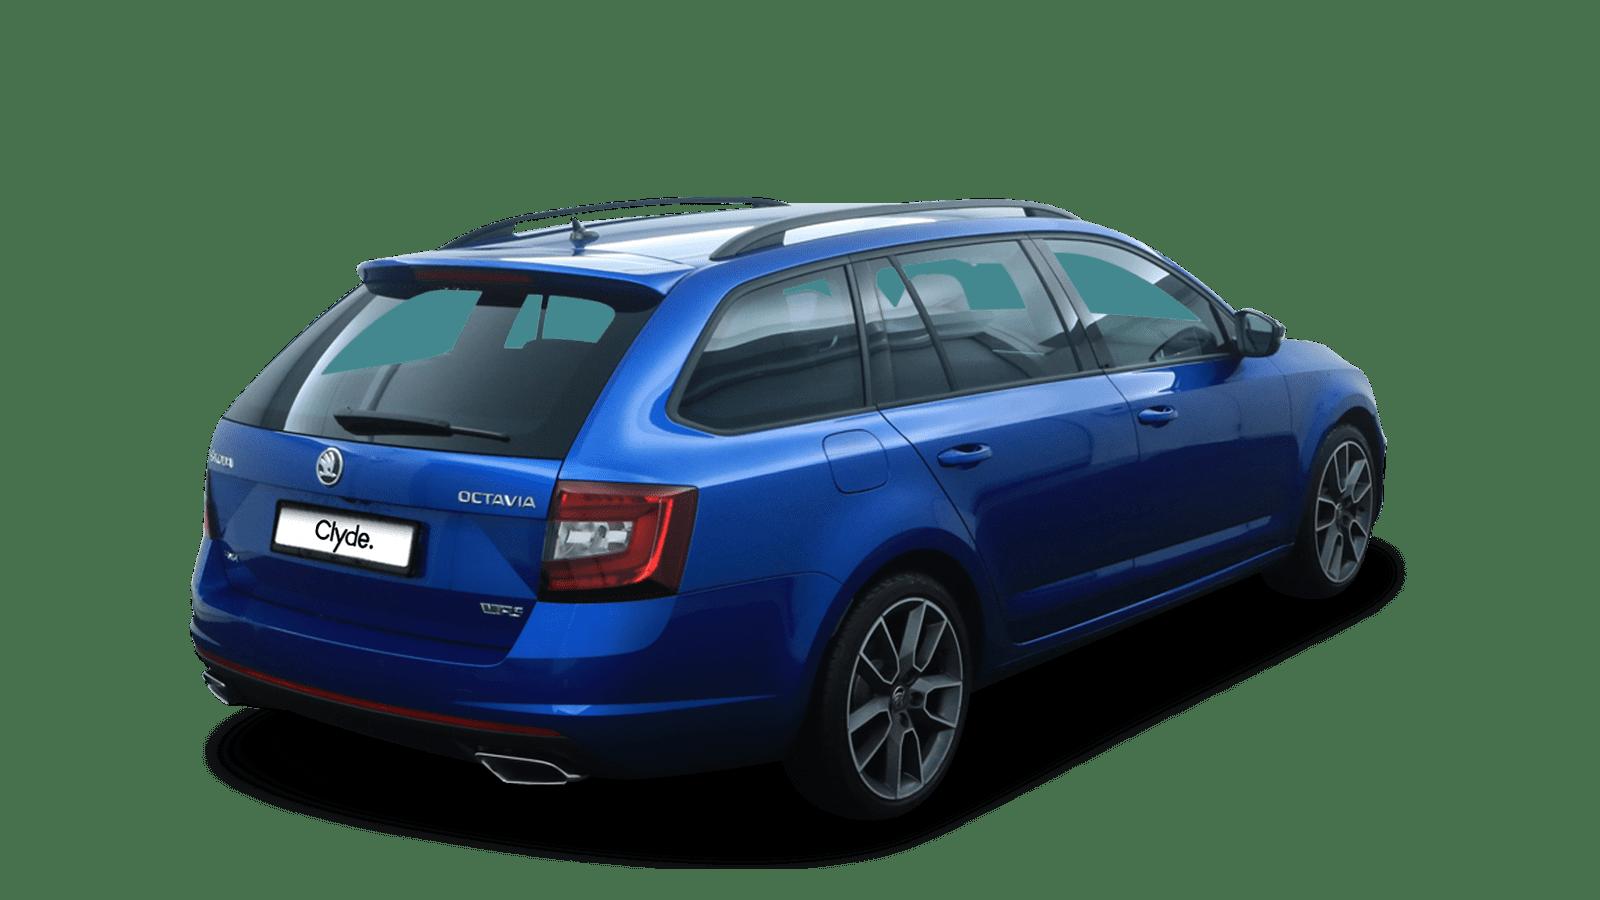 ŠKODA Octavia Combi RS Blue back - Clyde car subscription